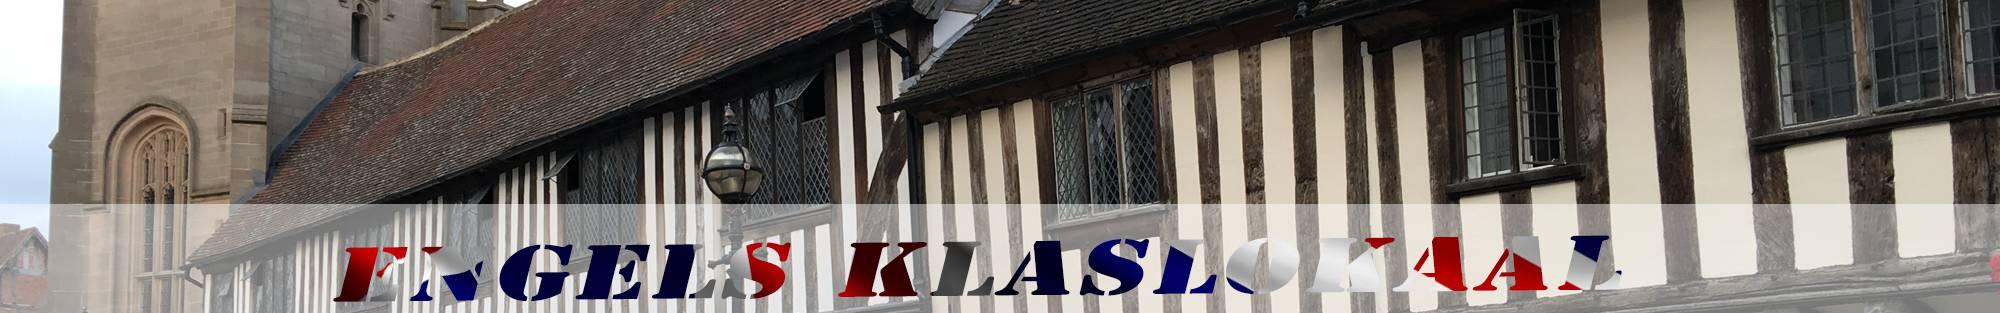 vakwerkhuizen Stratford-upon-Avon header engels klaslokaal